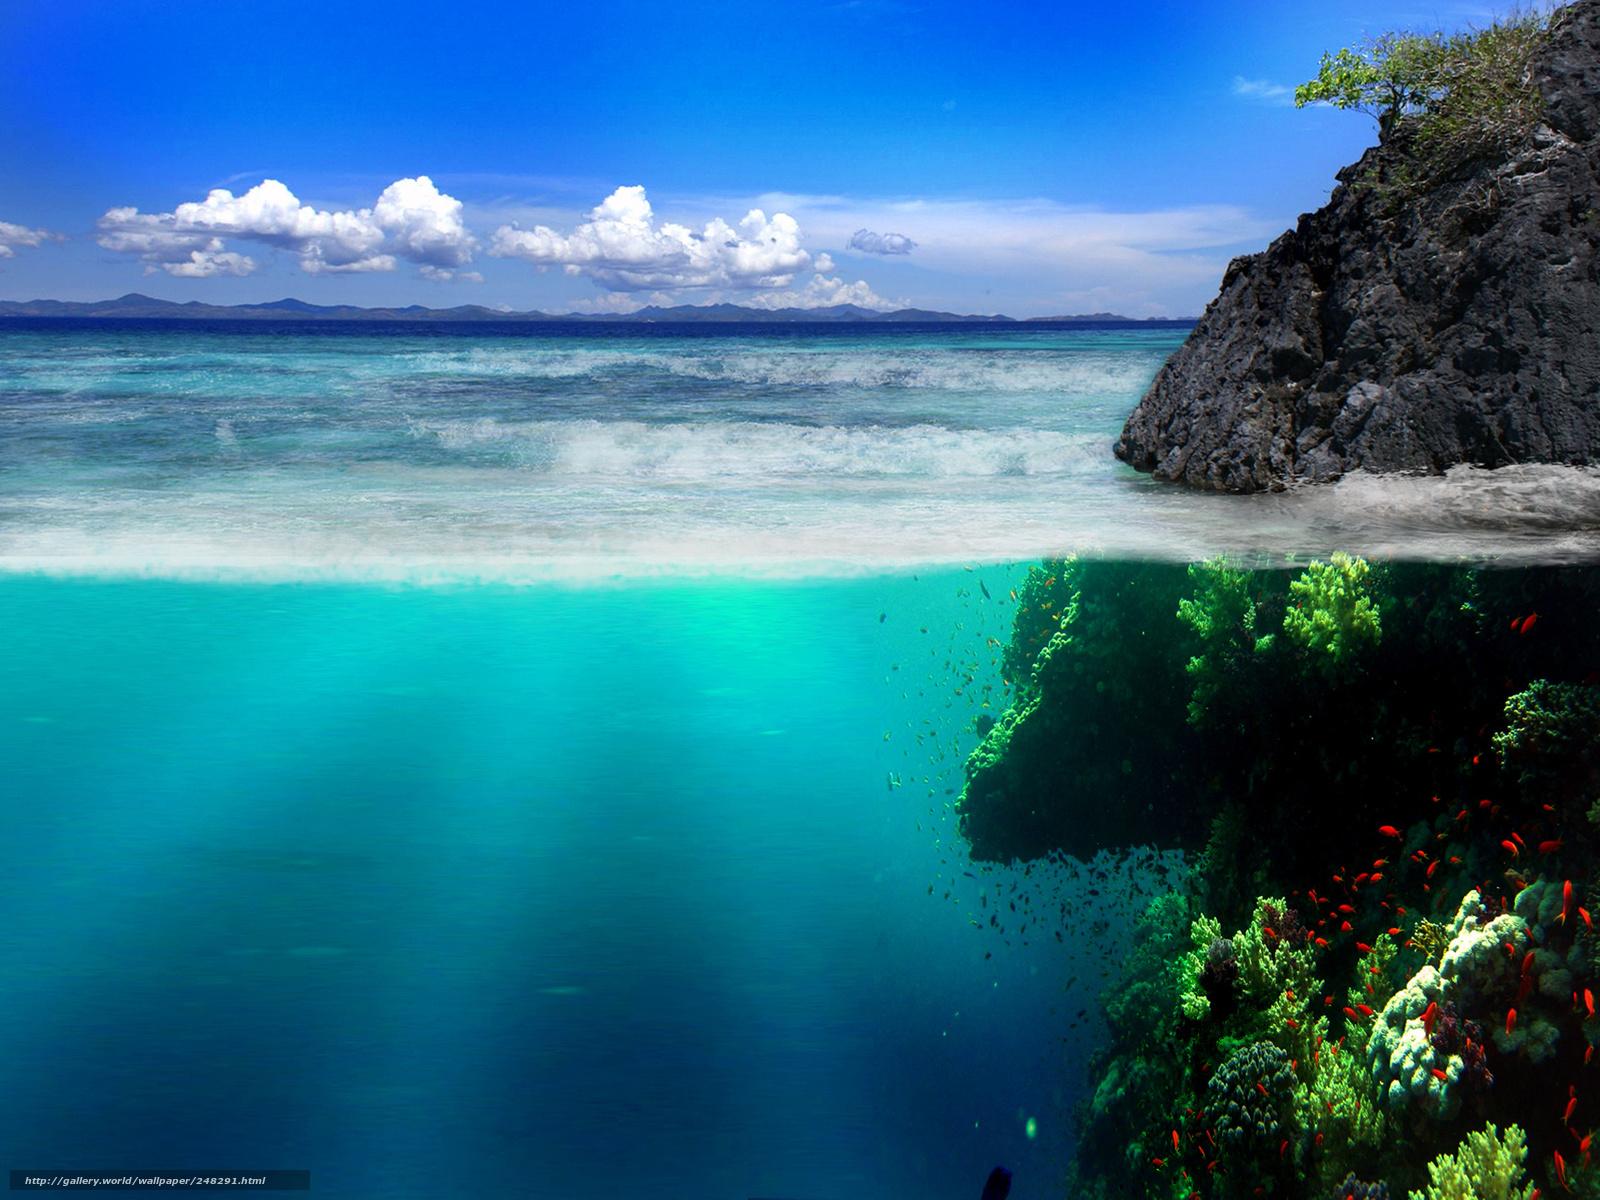 Фото алеты акеан 25 фотография